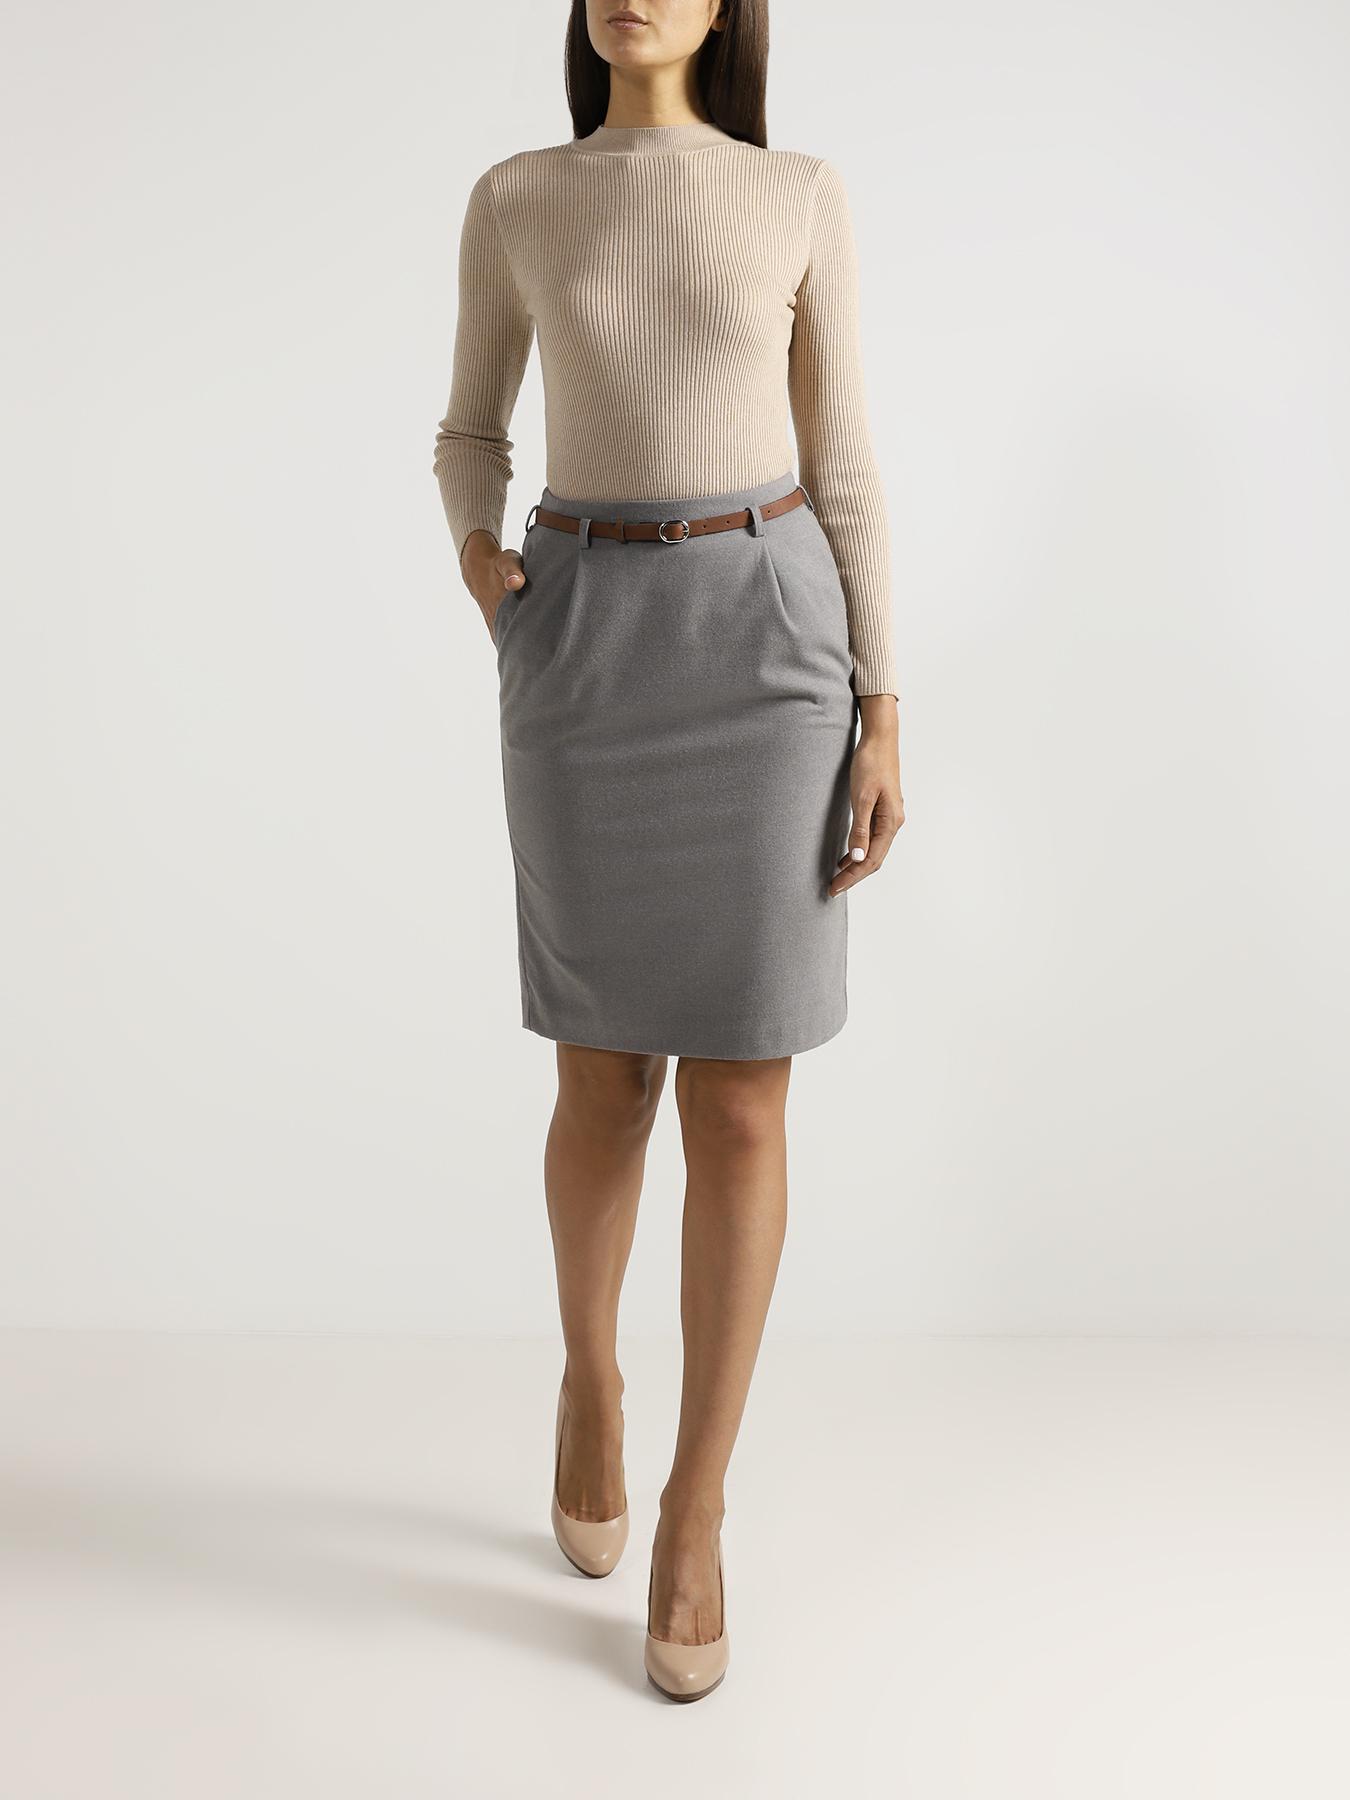 ORSA Orange Женская юбка 334037-026